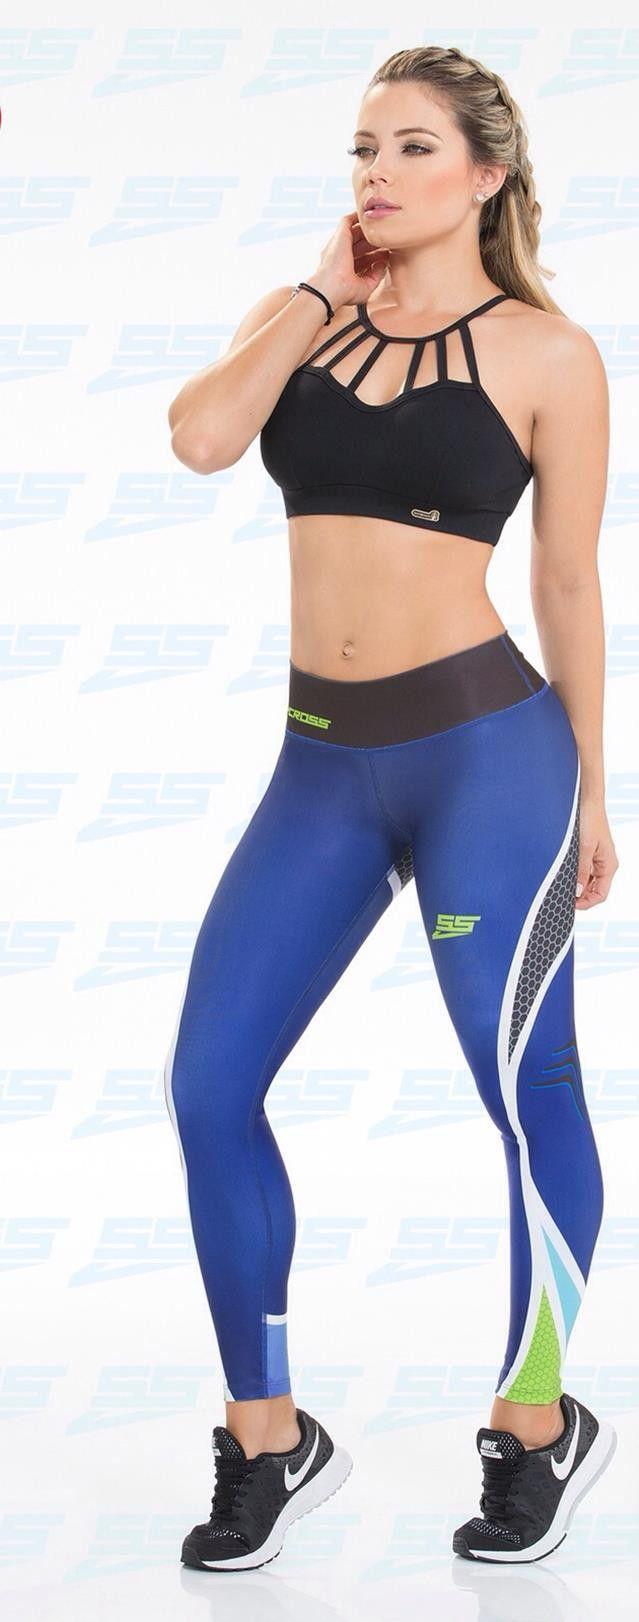 Mejores 122 im genes de ropa deportiva en pinterest moda for Rosario fitness gimnasio